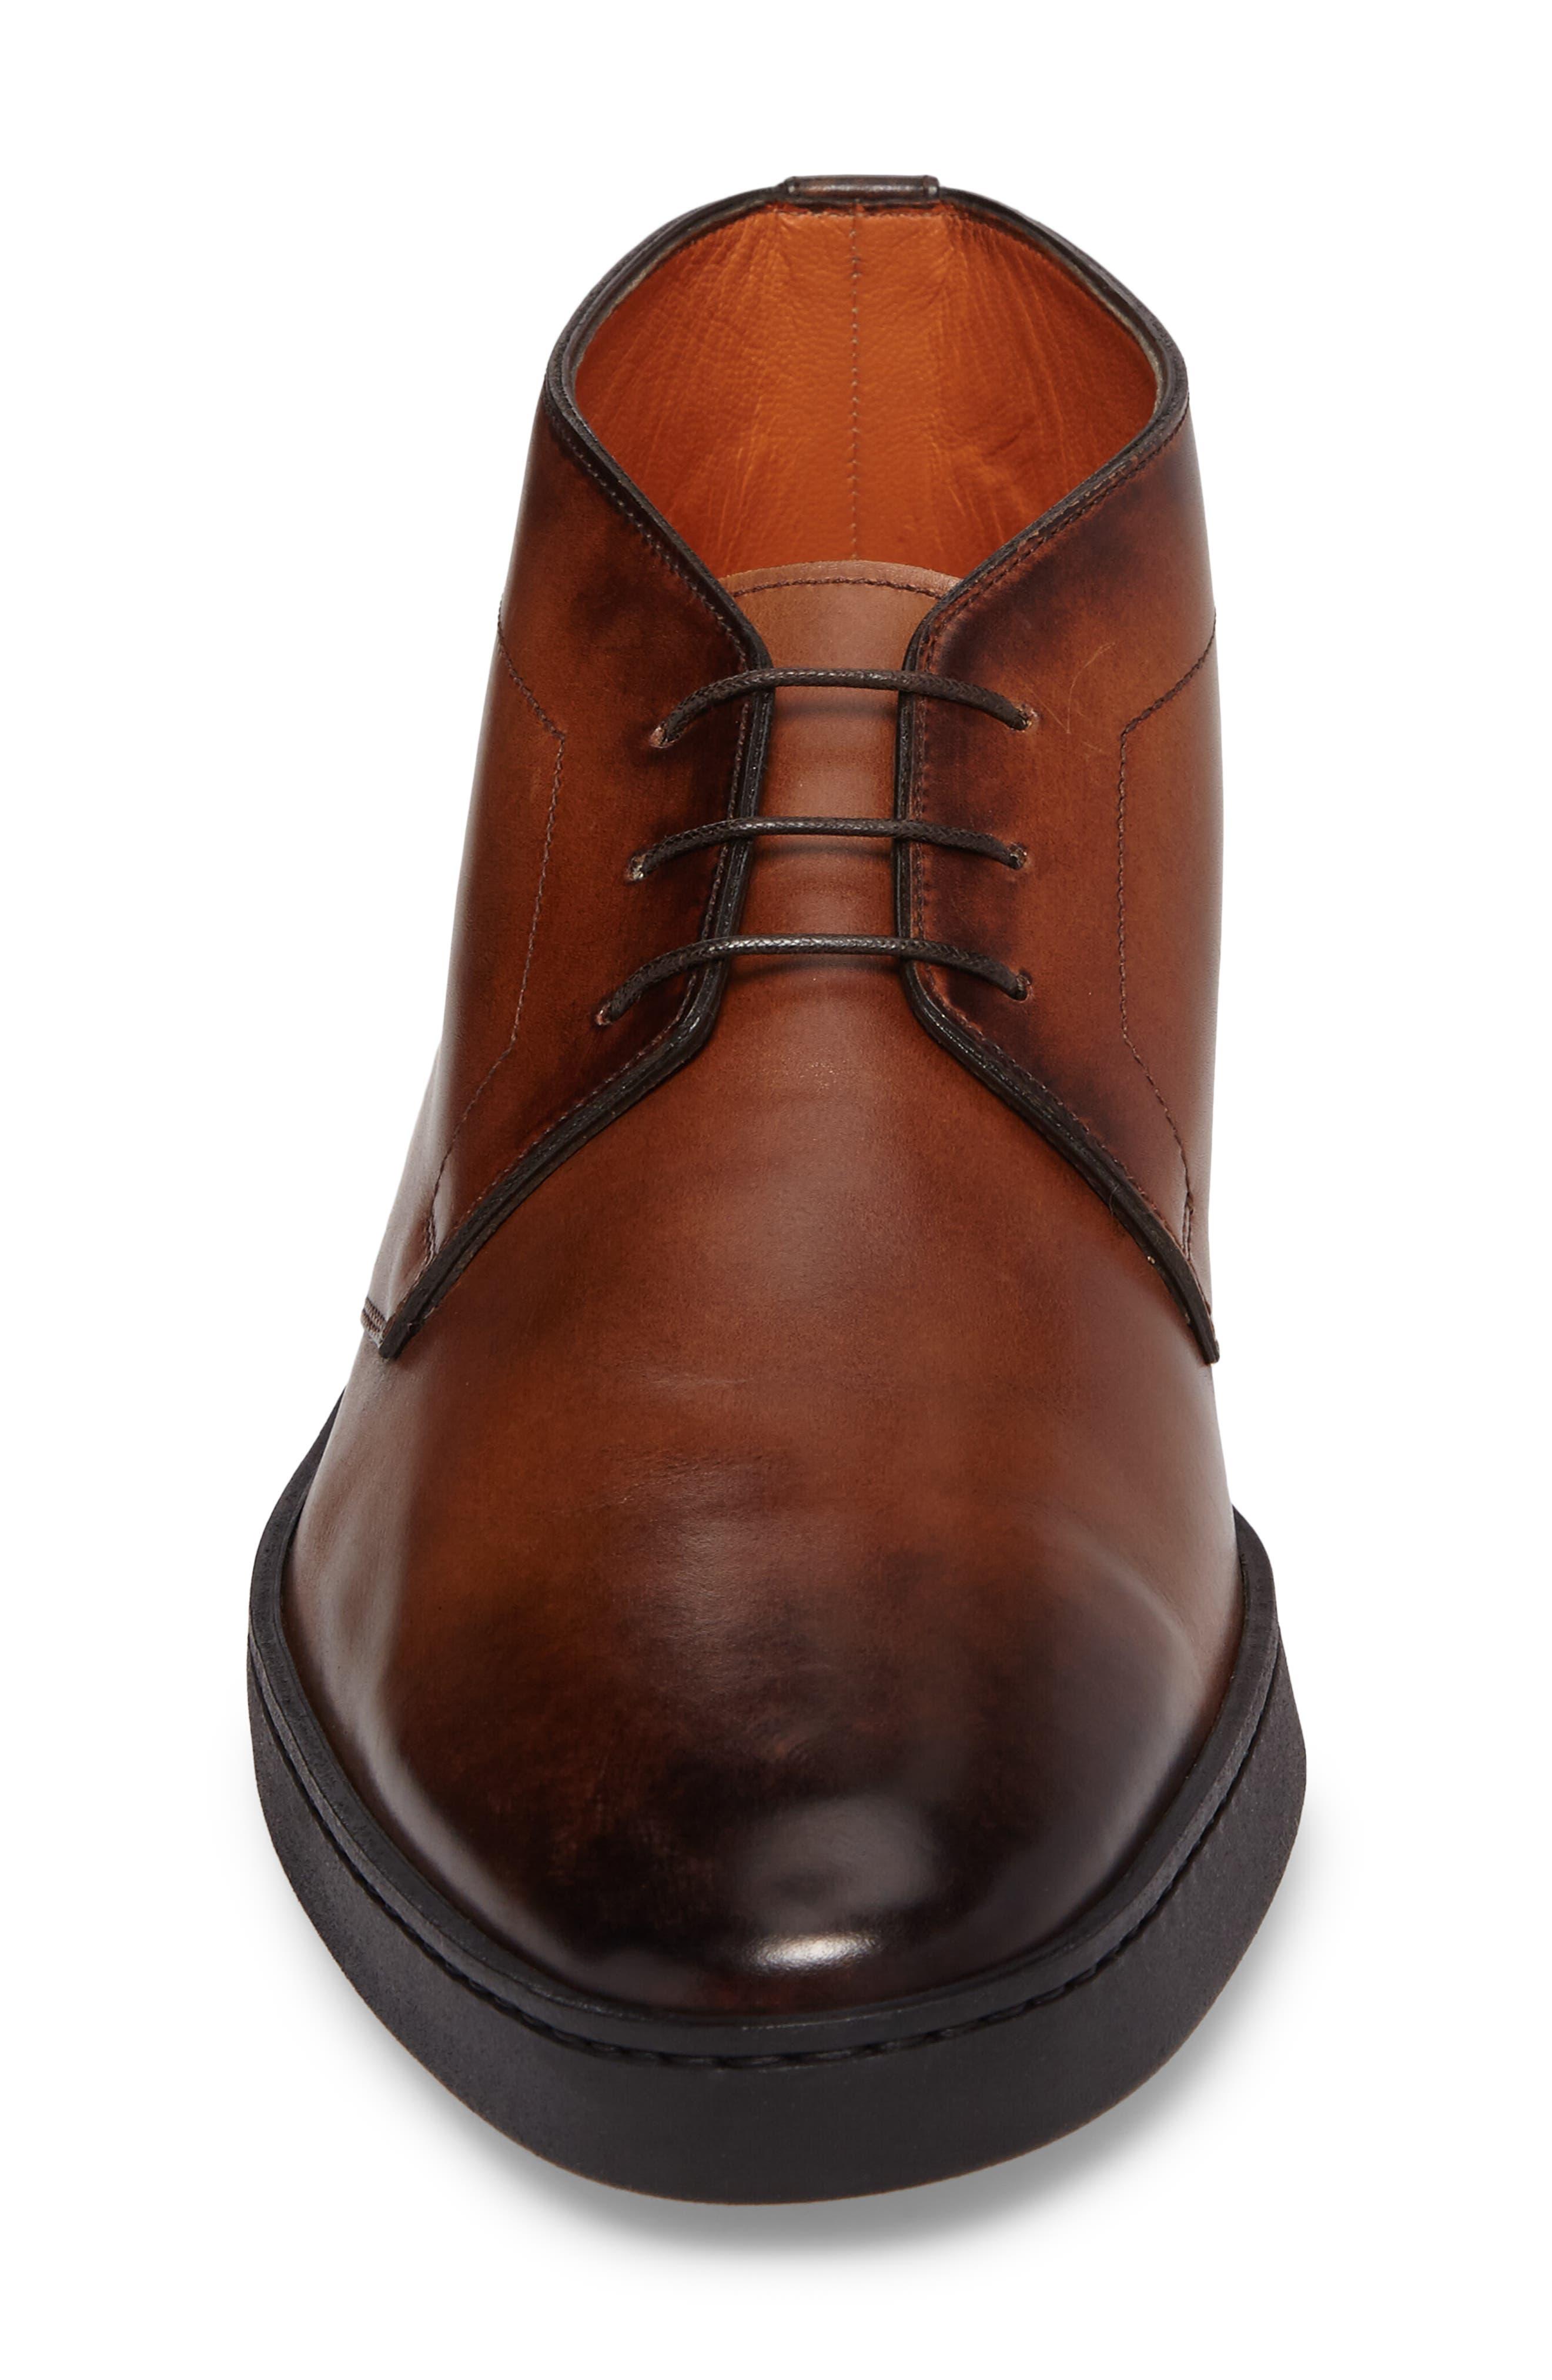 Eddy Chukka Sneaker Boot,                             Alternate thumbnail 3, color,                             Brown